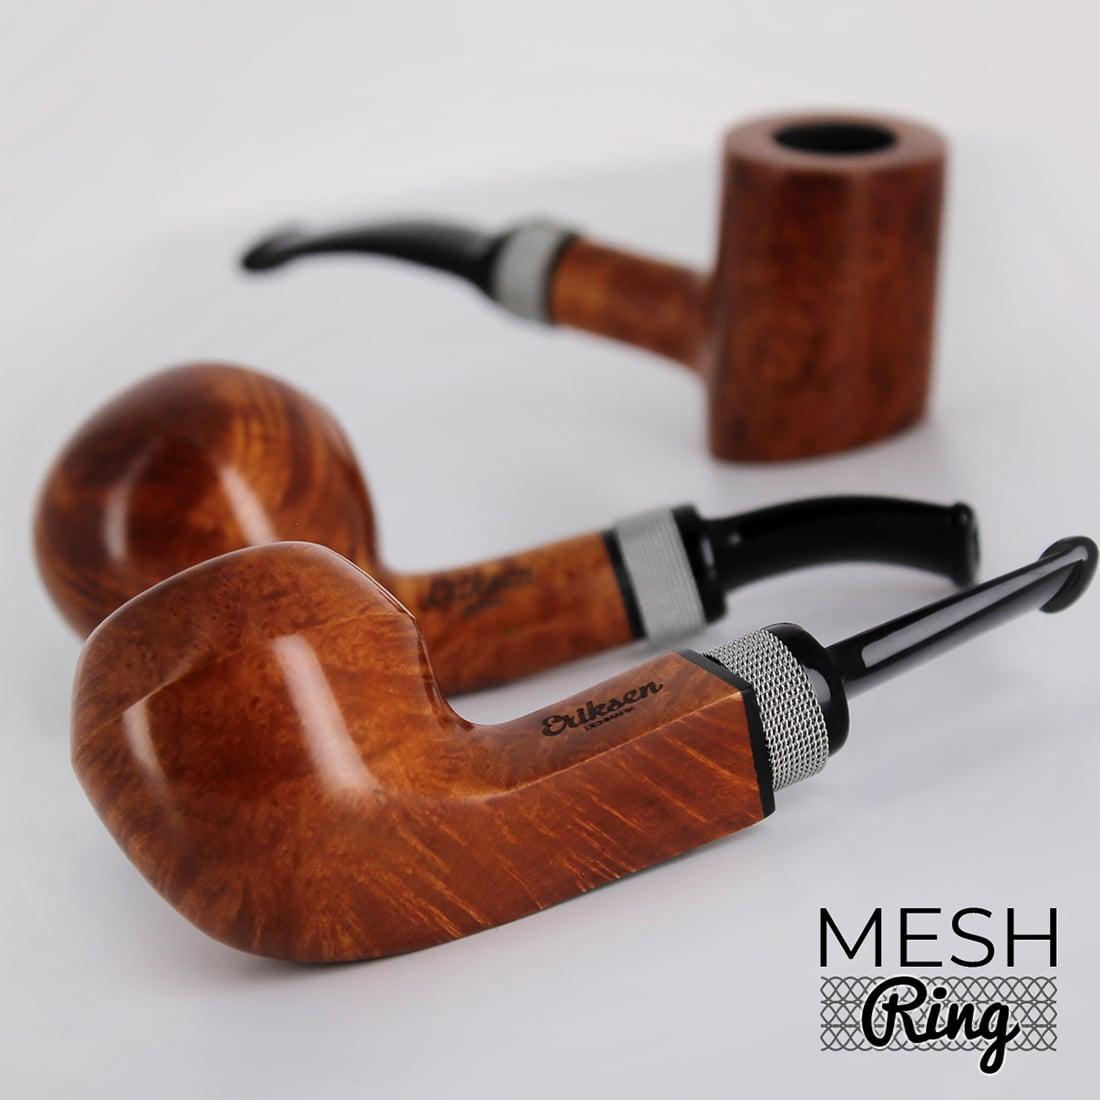 Photo #3 de Pipe Nording Eriksen Mesh Ring Cintrée